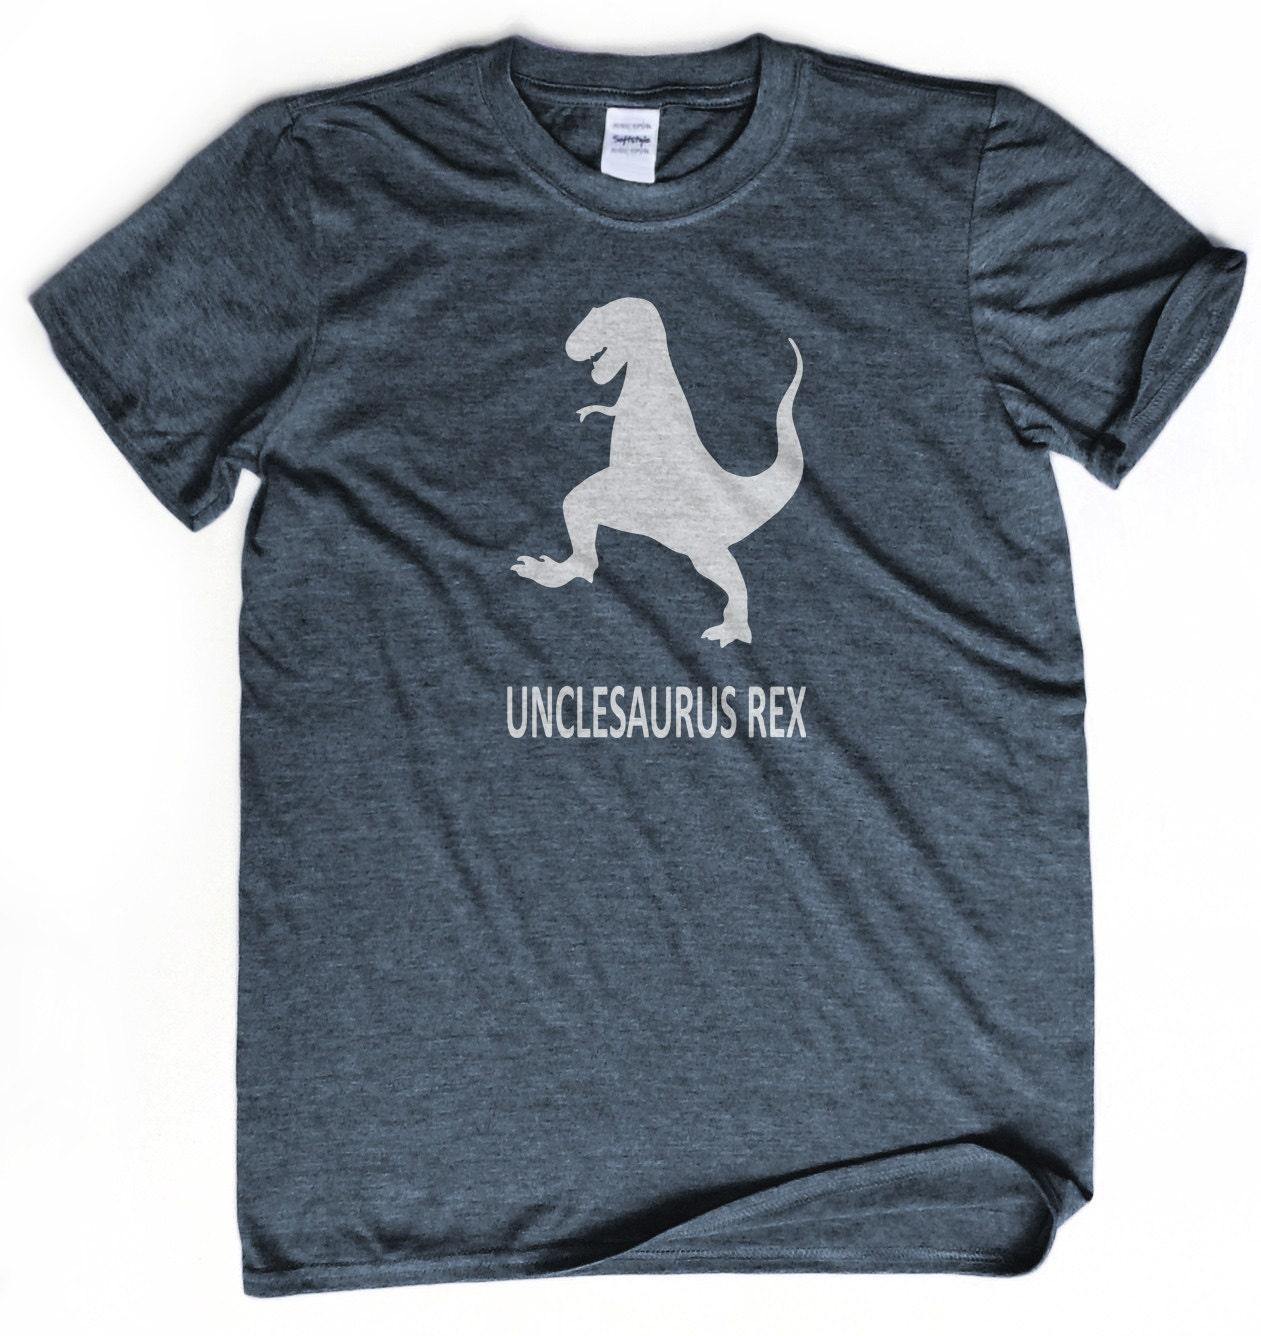 Onkel Geschenk Unclesaurus Rex T-shirt Onkel Rex Tshirt neue